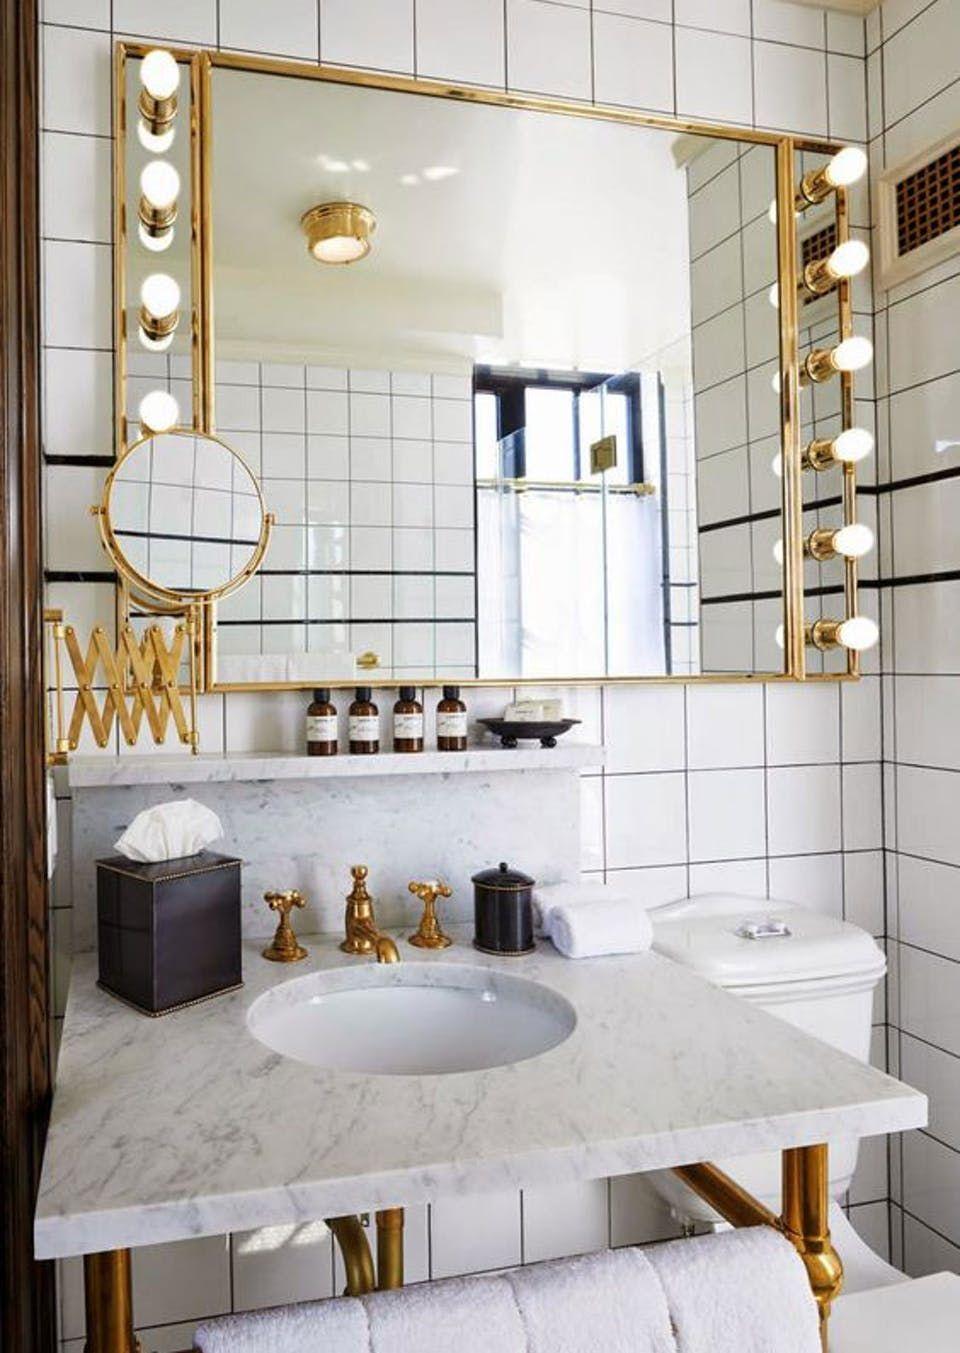 Amazing Restaurant interior design ideas, stylish Cafe Interior ...